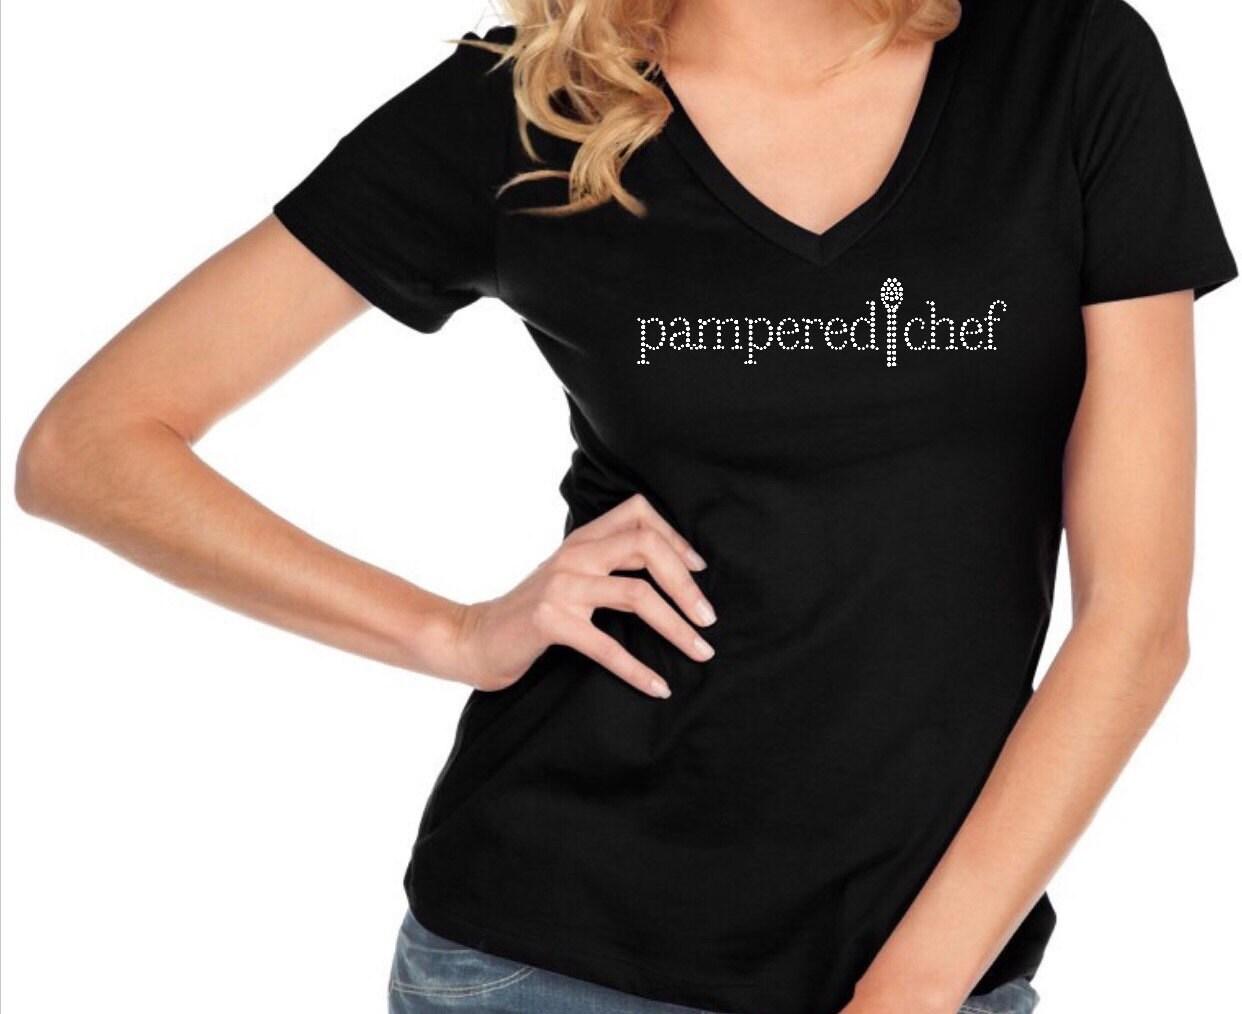 Bling Pampered Chef Custom Bedazzled Rhinestone Shirt